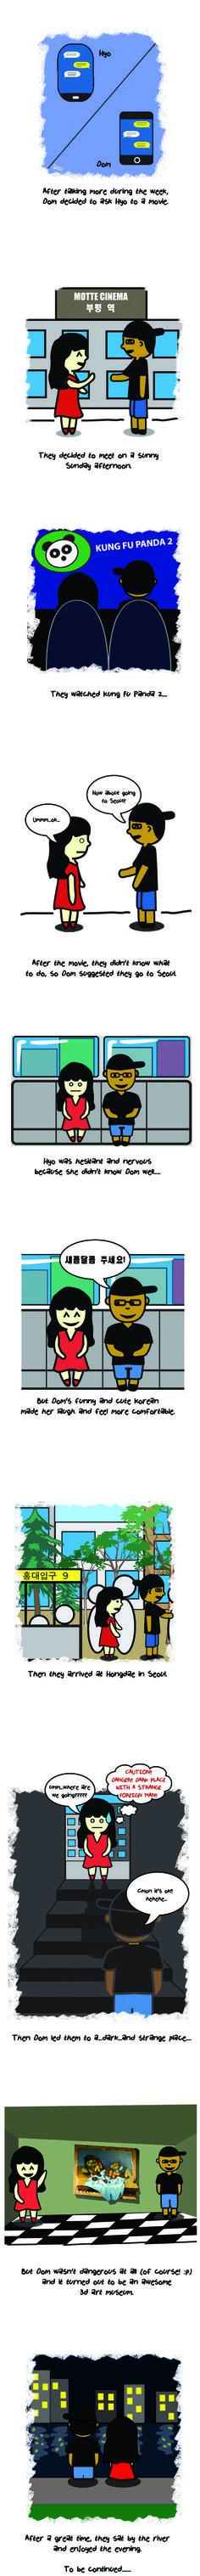 Hanlingo dating games